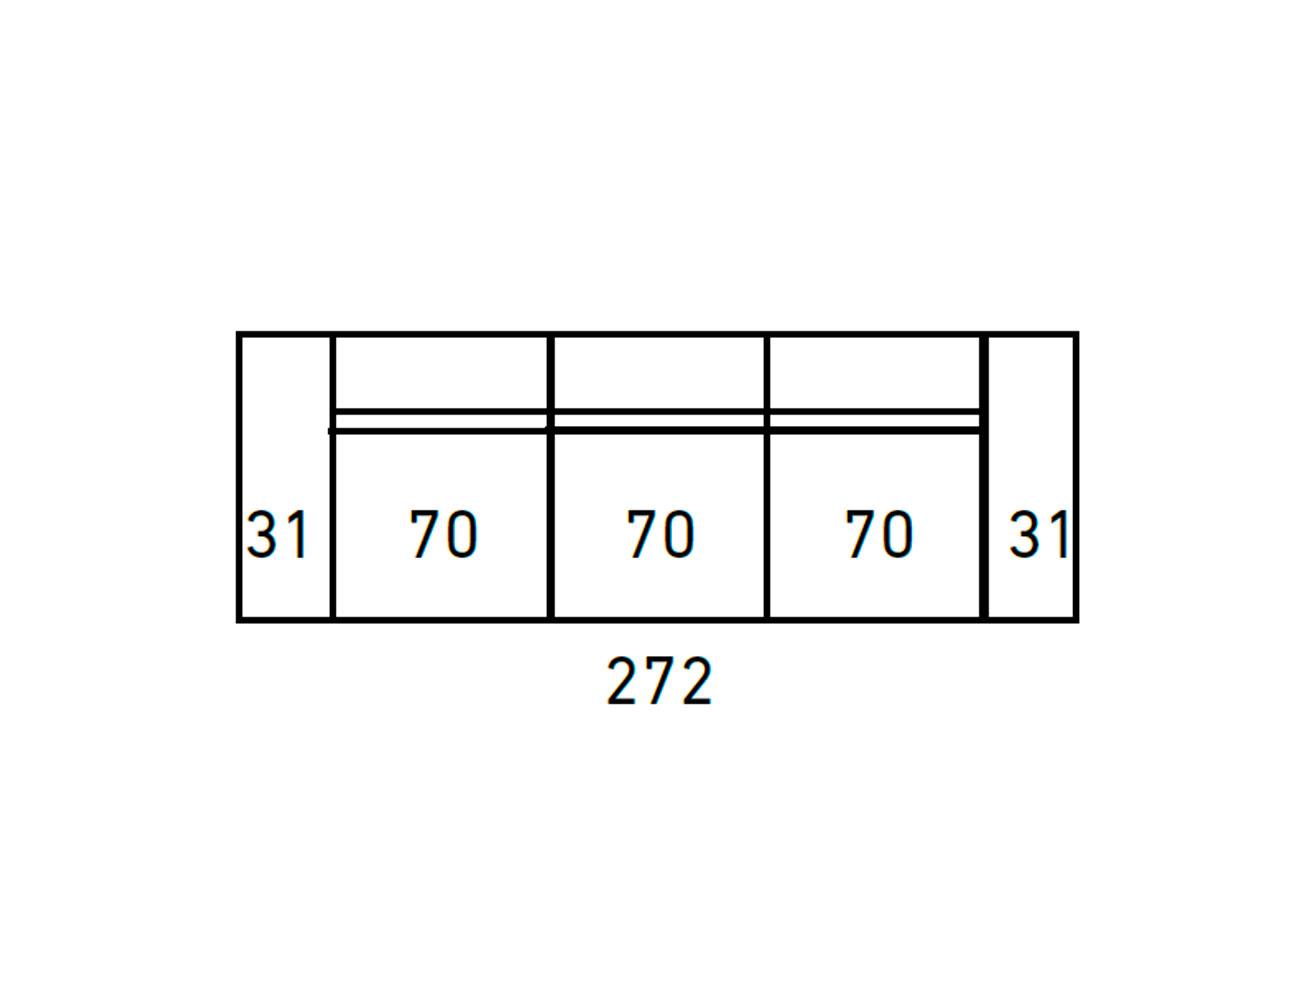 Croquis 2729